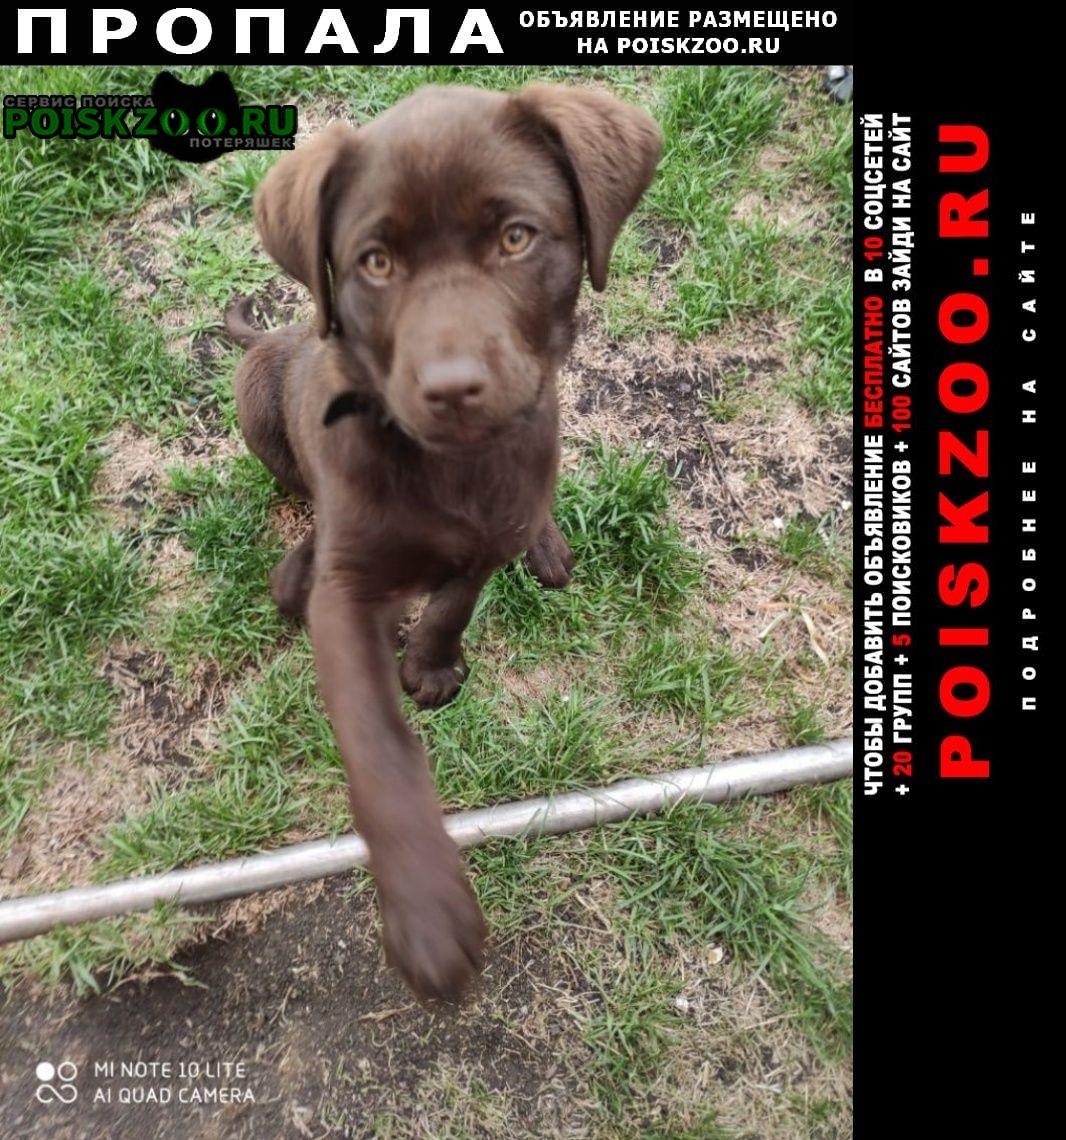 Пропала собака Белорецк